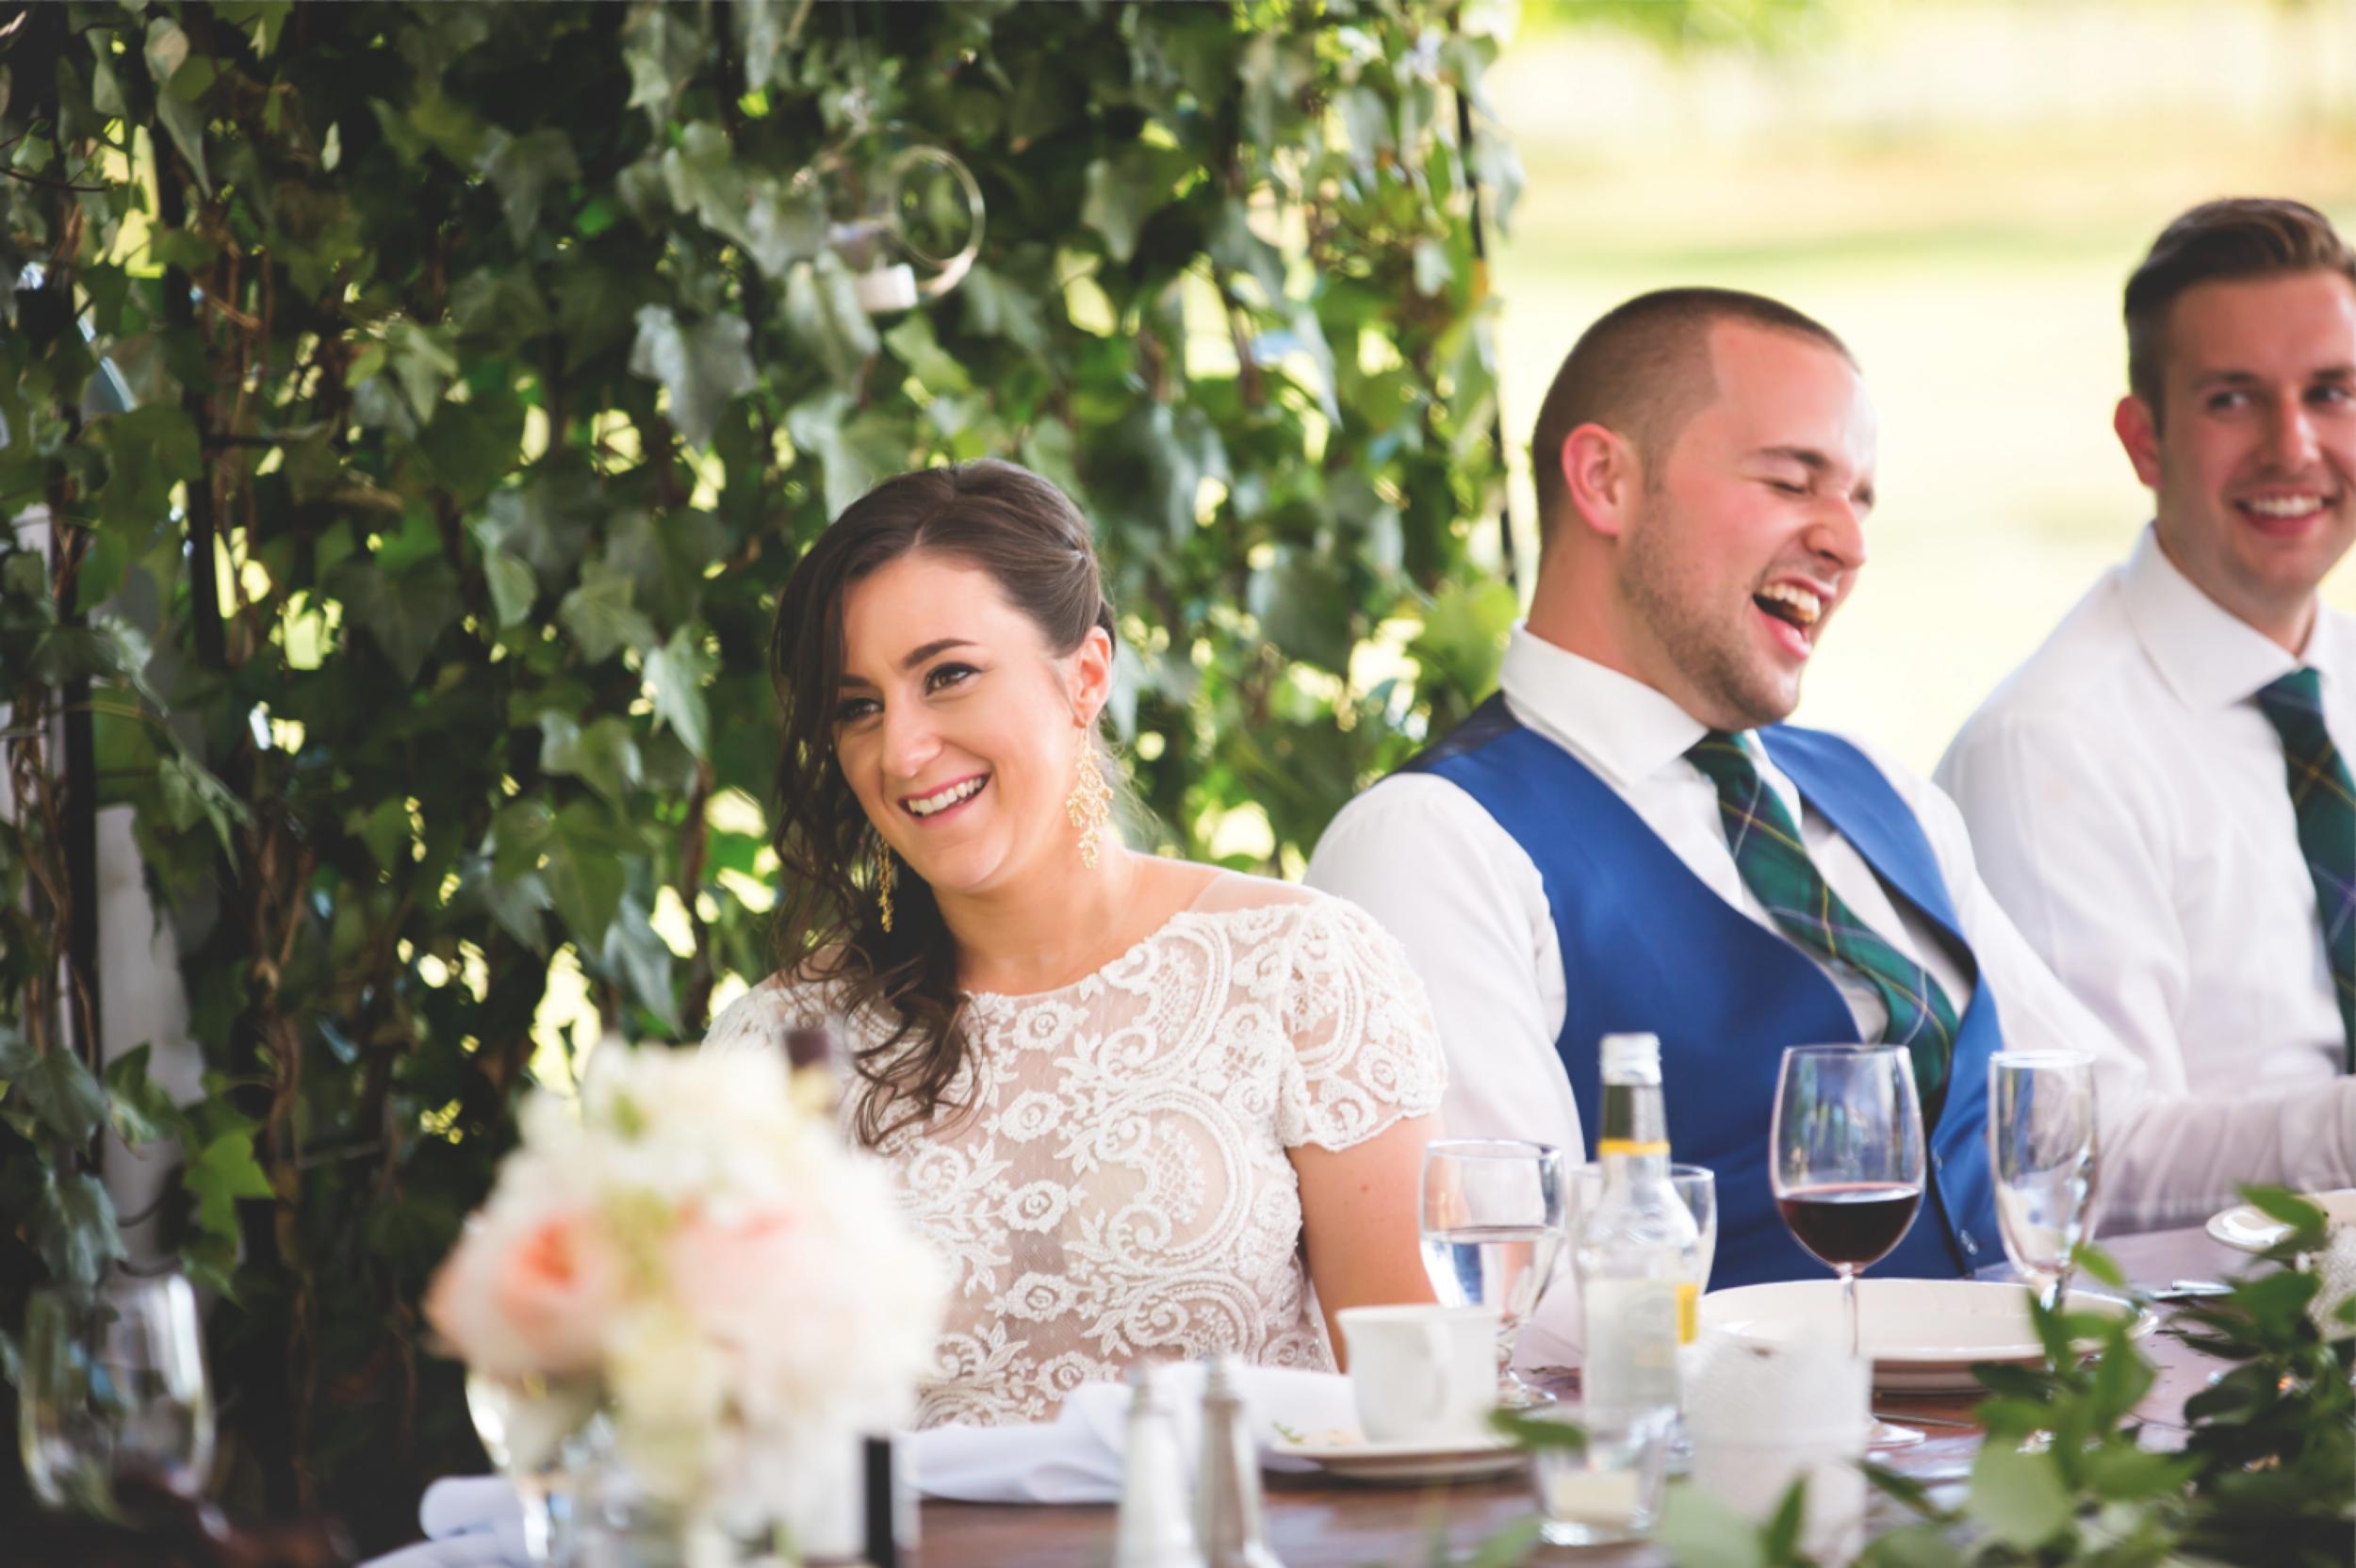 Wedding-Kurtz-Orchard-Market-Niagara-On-The-Lake-Toronto-Hamilton-Burlington-Oakville-Niagara-Wedding-Photographer-Photography-Moments-by-Lauren-Photo-Image-72.png